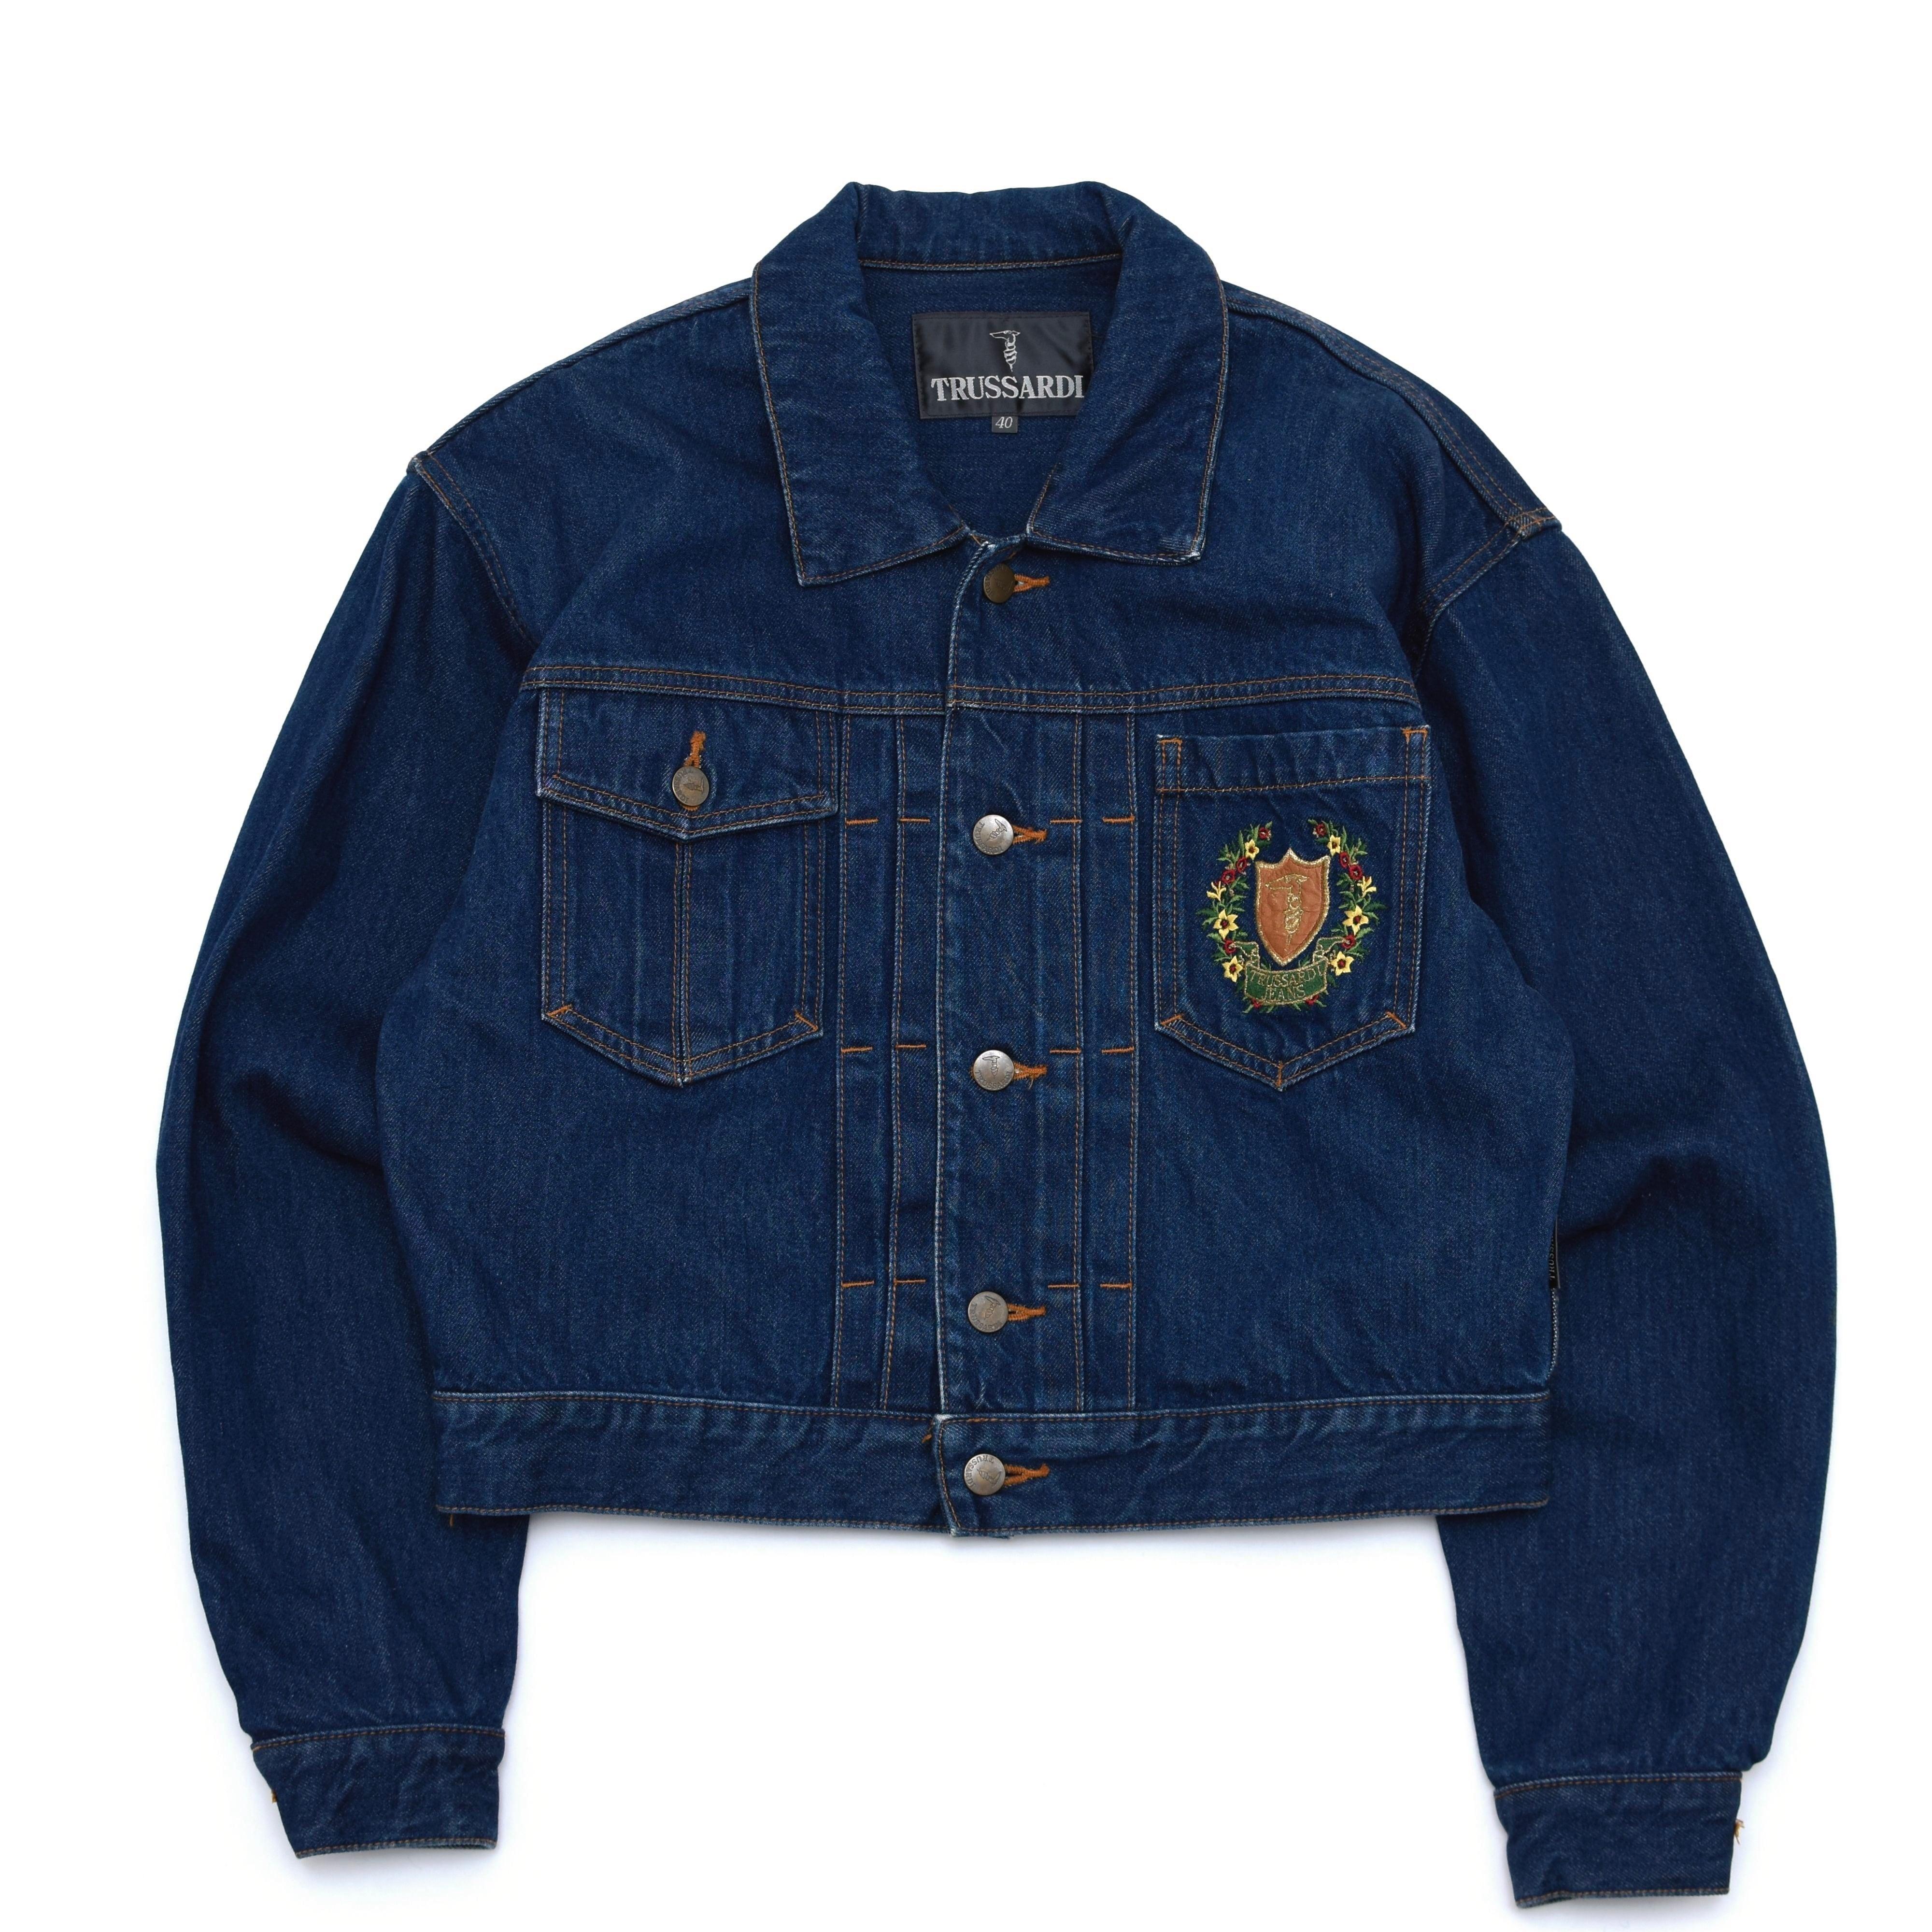 TRUSSARDI  emblem embroidery denim jacket